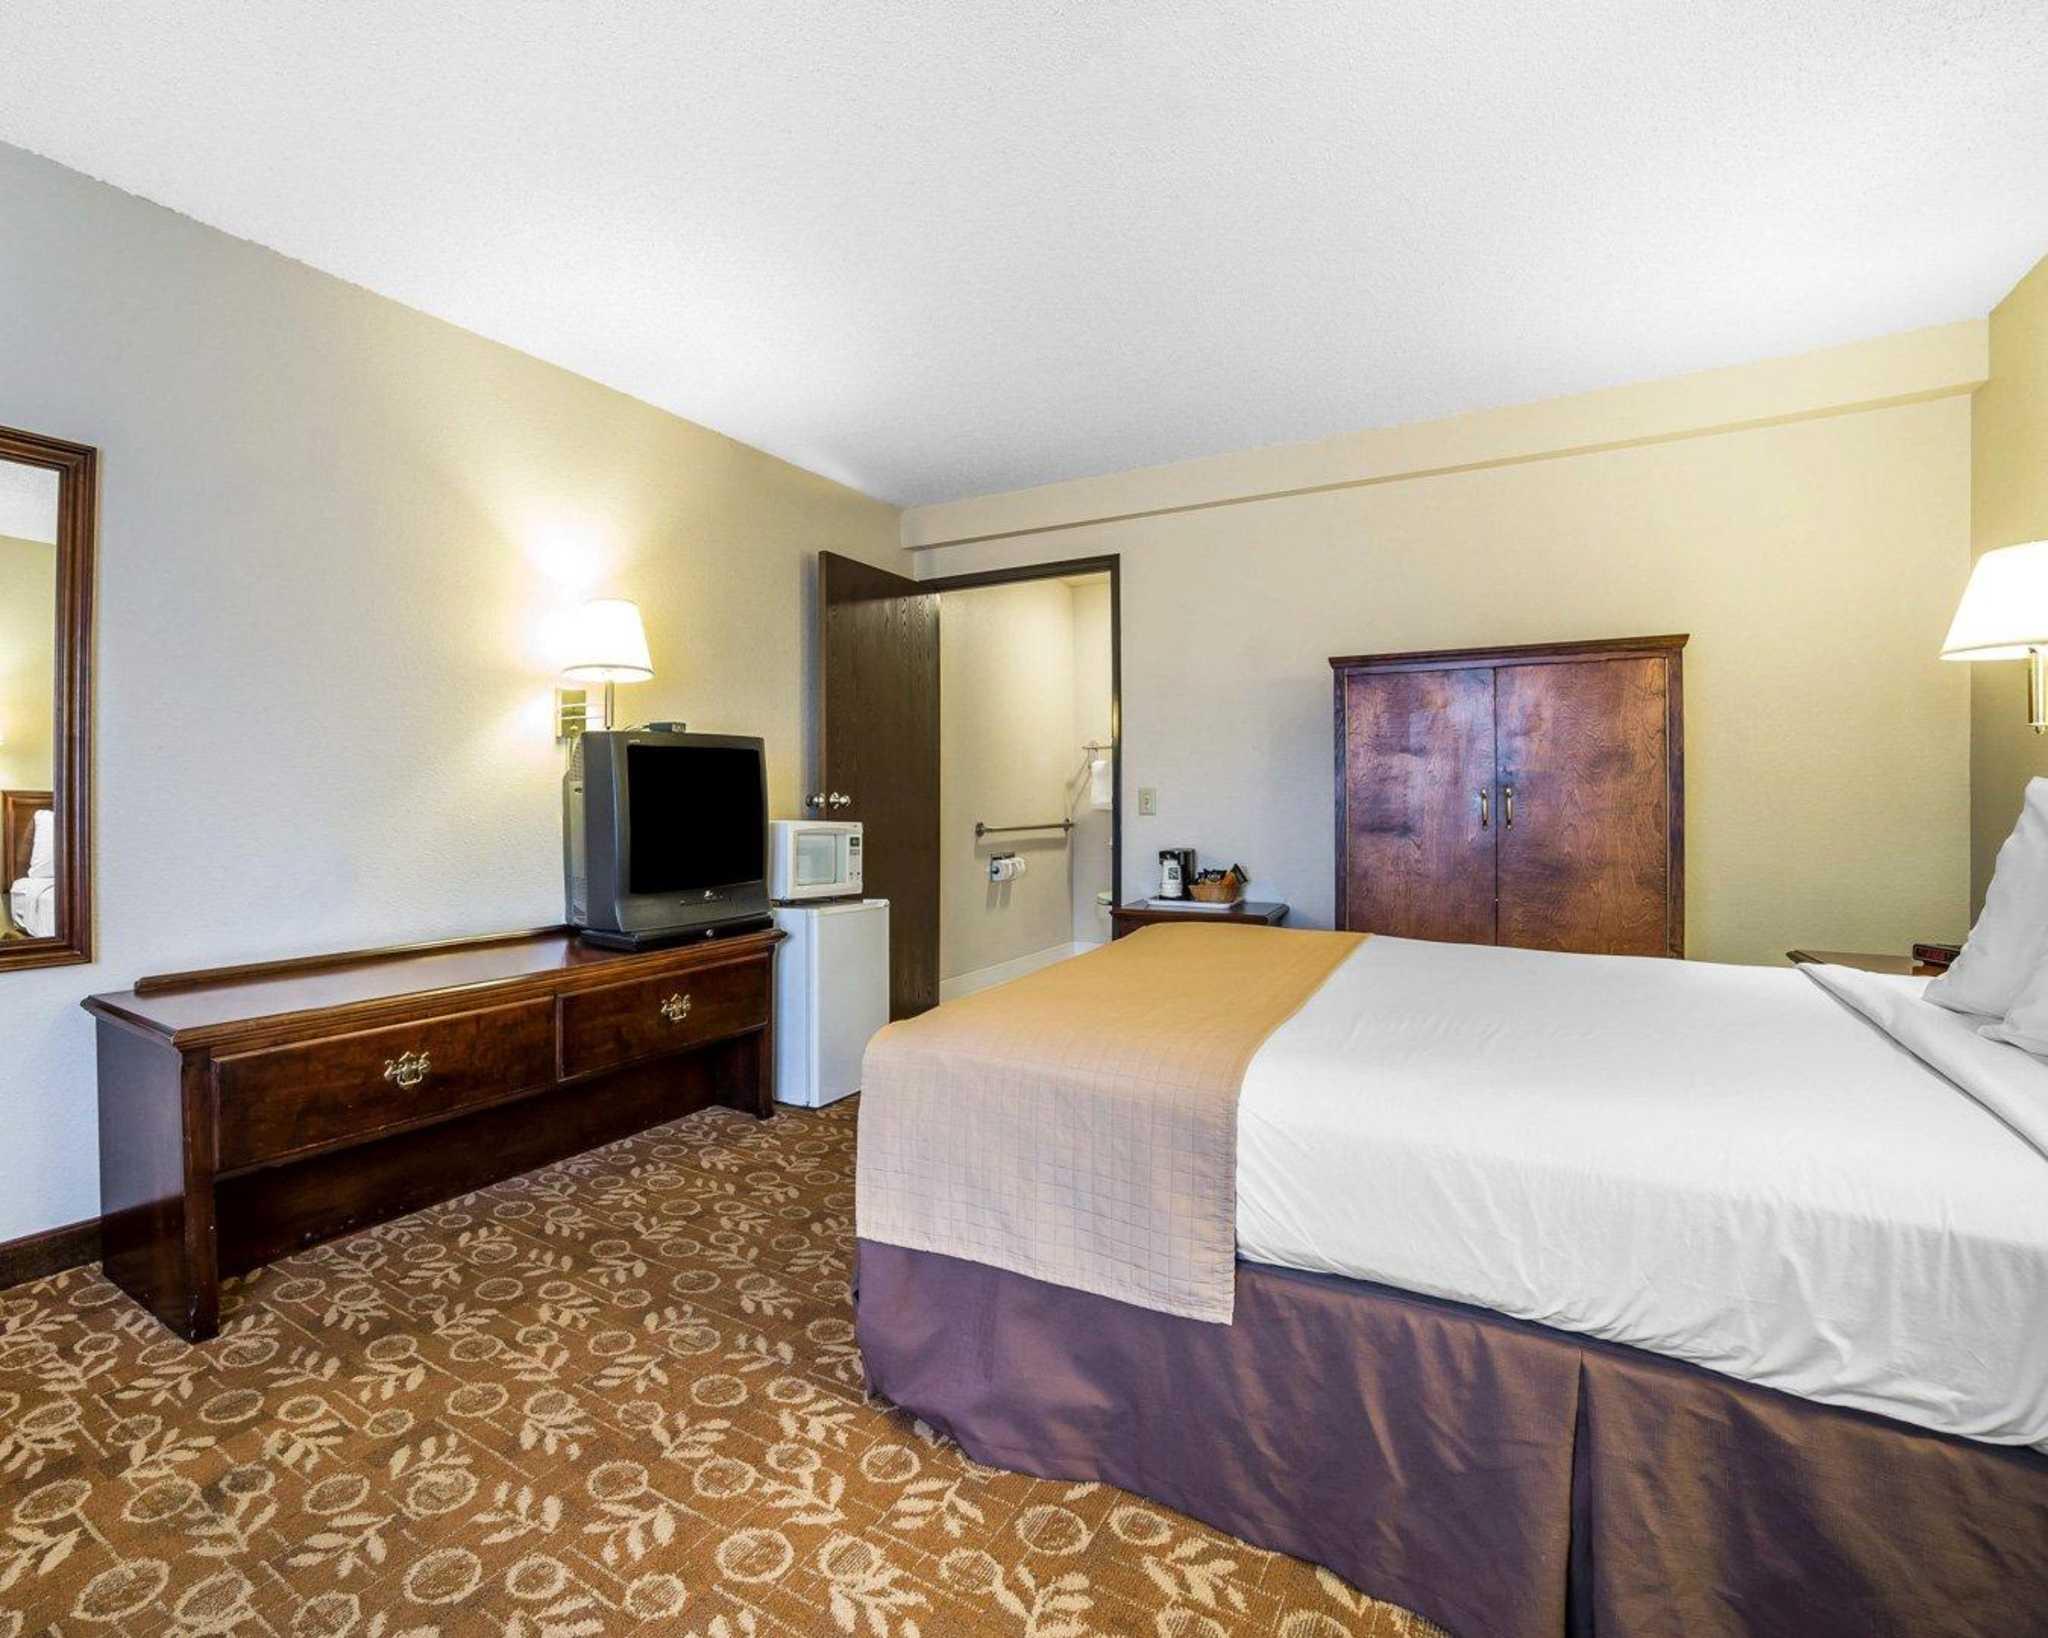 Quality Inn & Suites Minden US-395 image 4